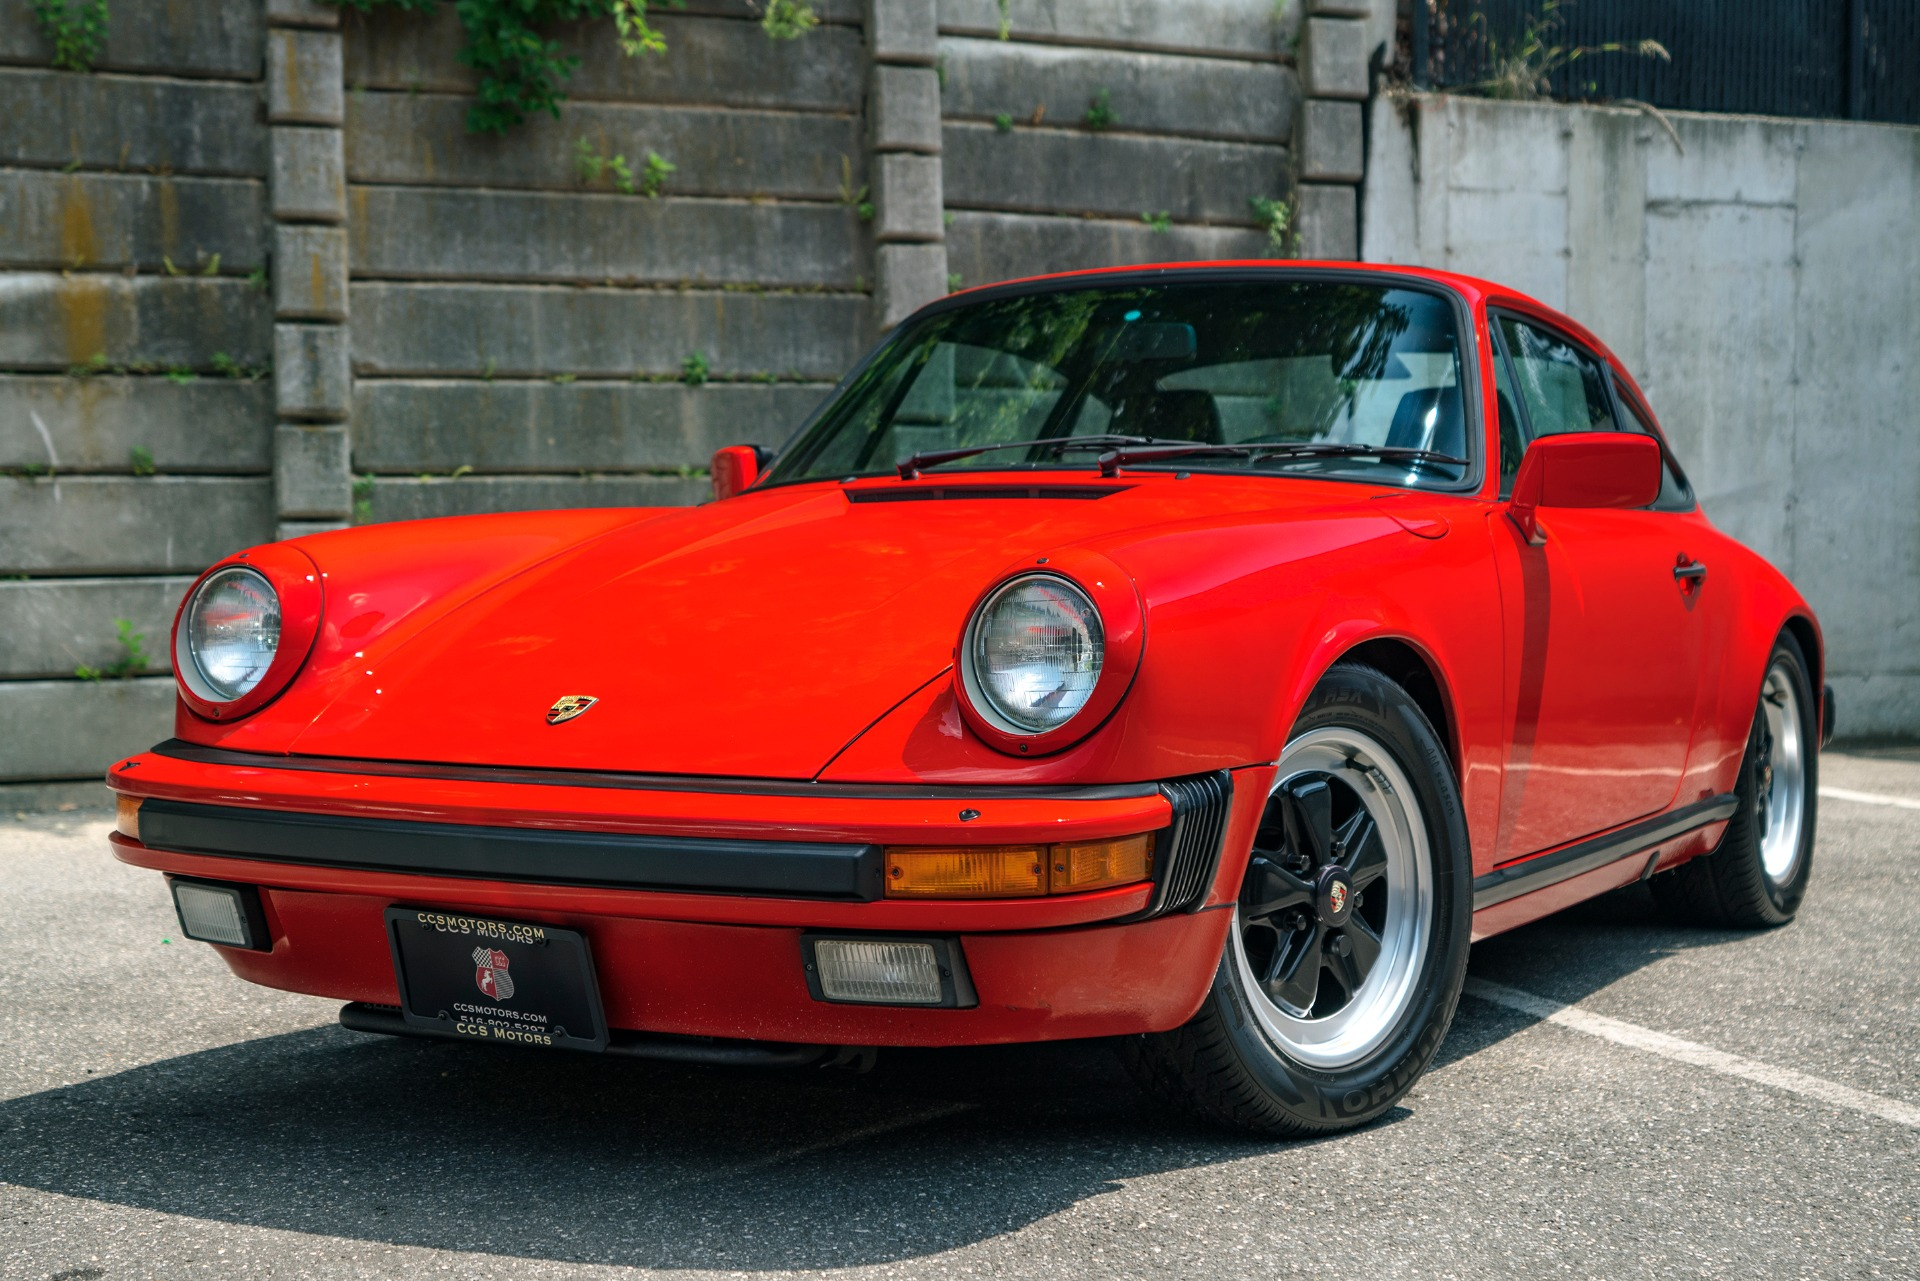 1986 porsche 911 carrera stock 1415 for sale near oyster. Black Bedroom Furniture Sets. Home Design Ideas